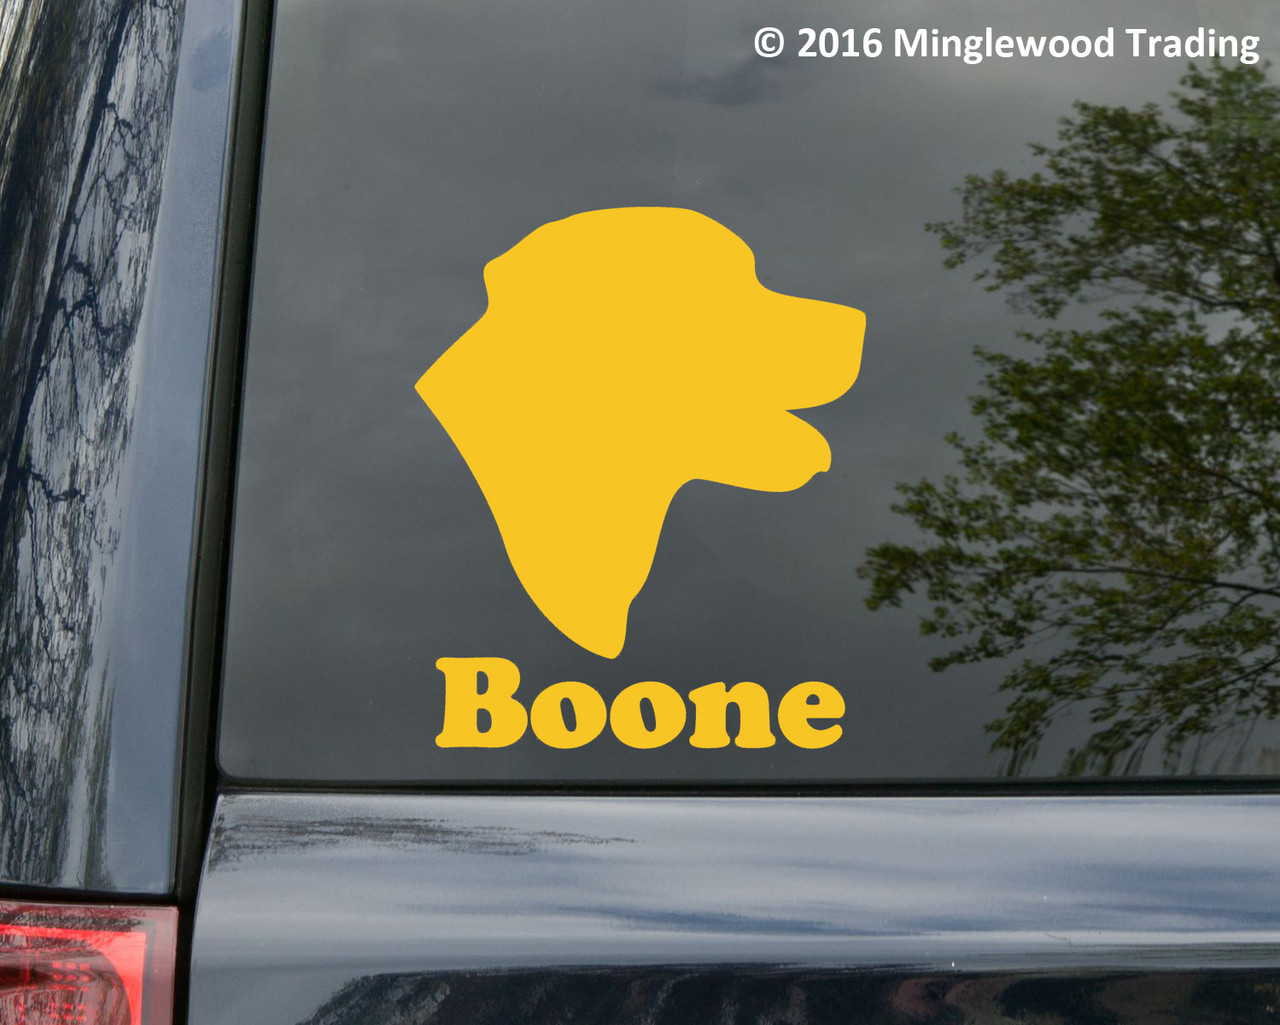 LABRADOR RETRIEVER Head with Personalized Name Vinyl Decal Sticker - Dog Profile Silhouette